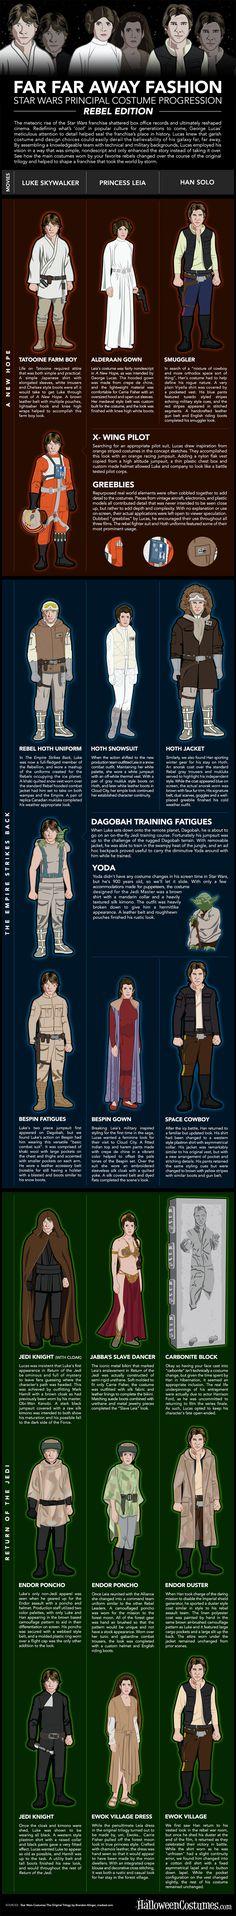 Star Wars Costume Evolution Infographic